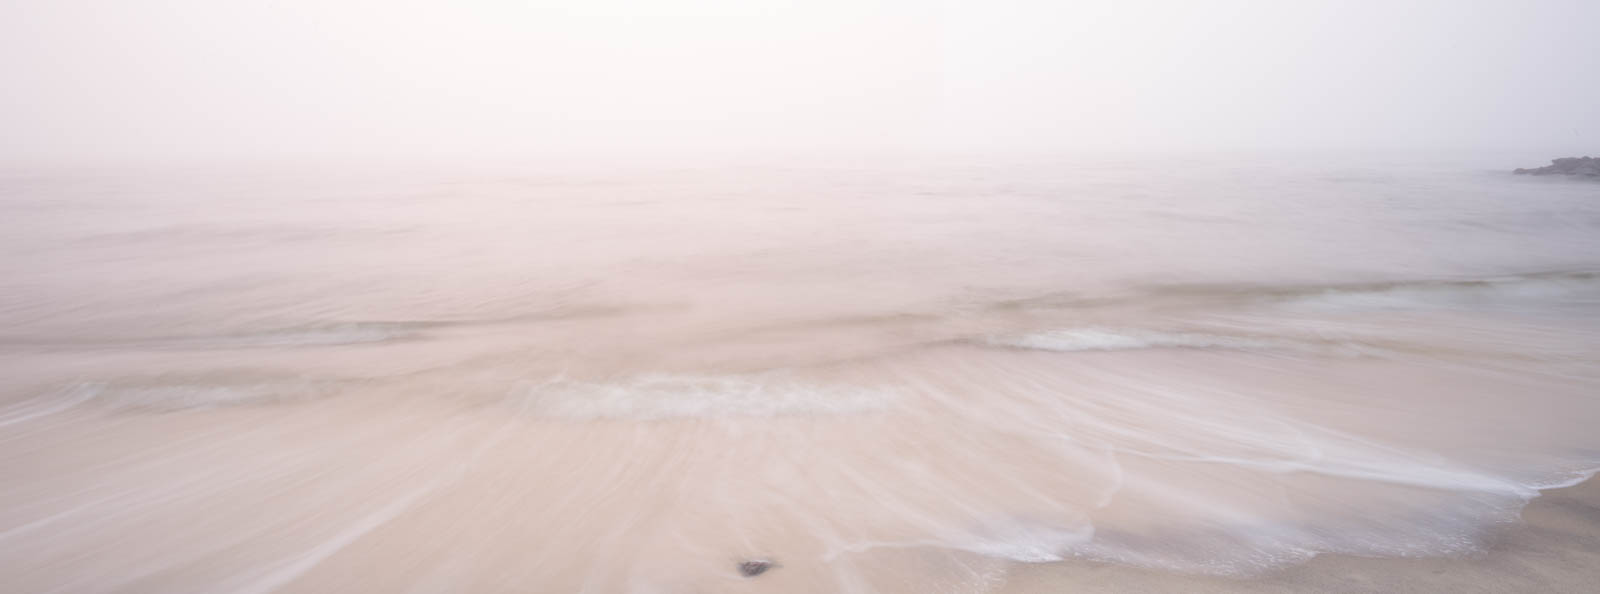 dauphin_island_beach03